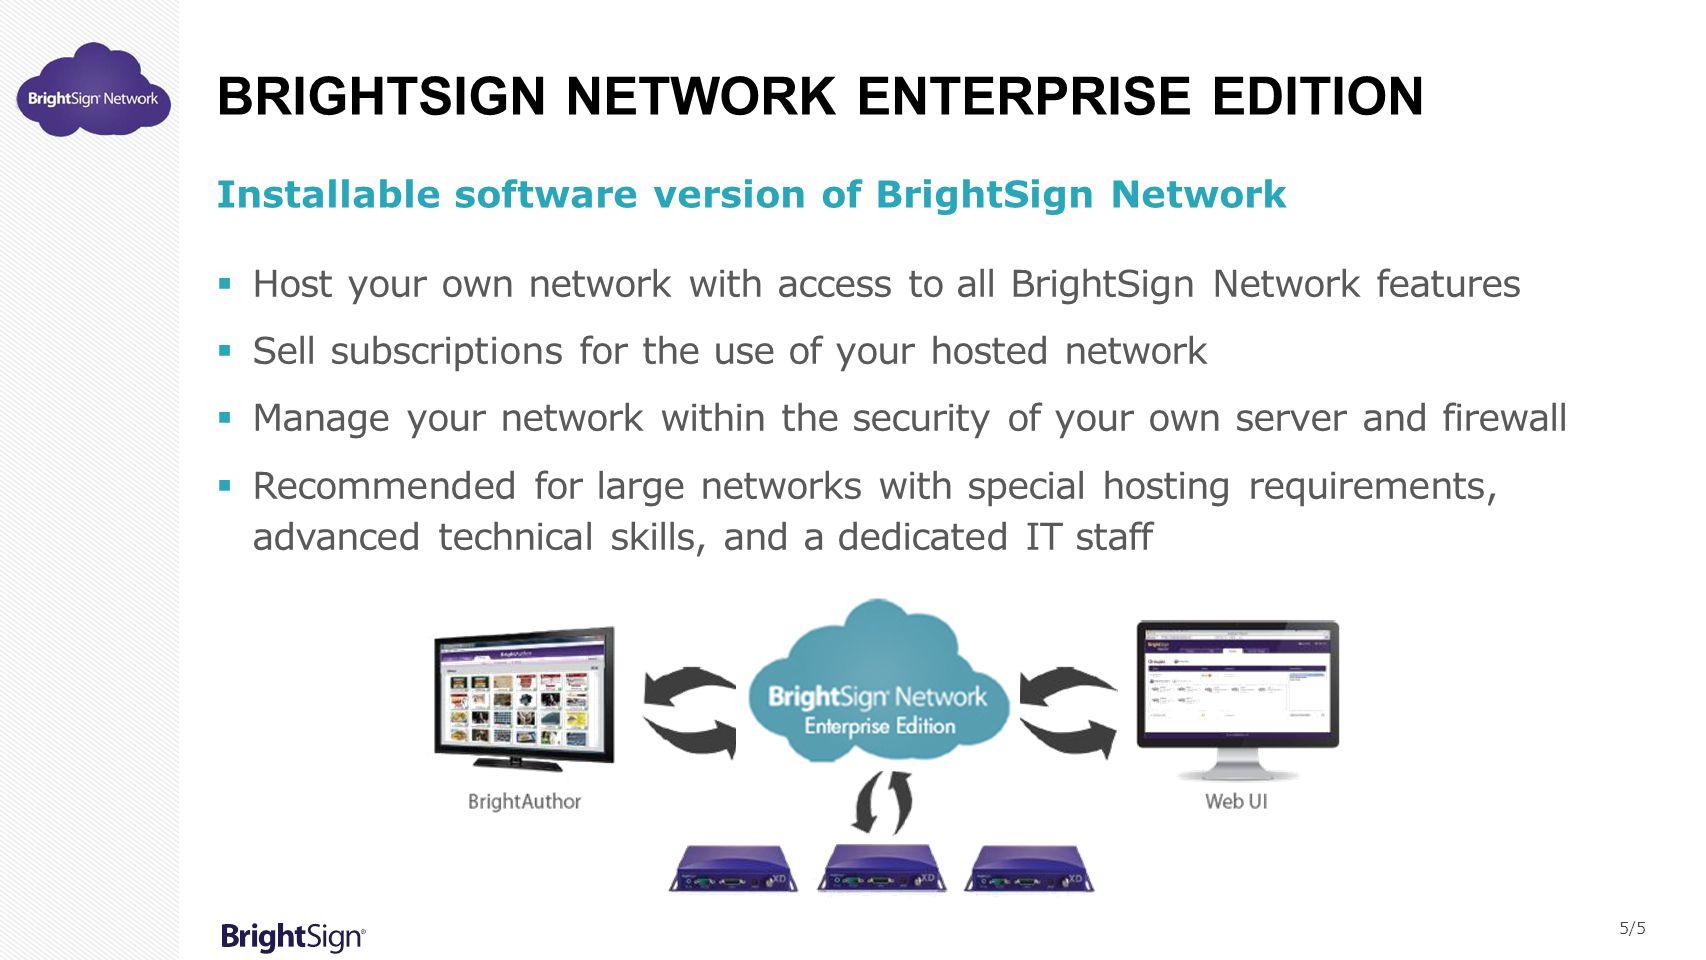 BrightSign Network Enterprise Edition